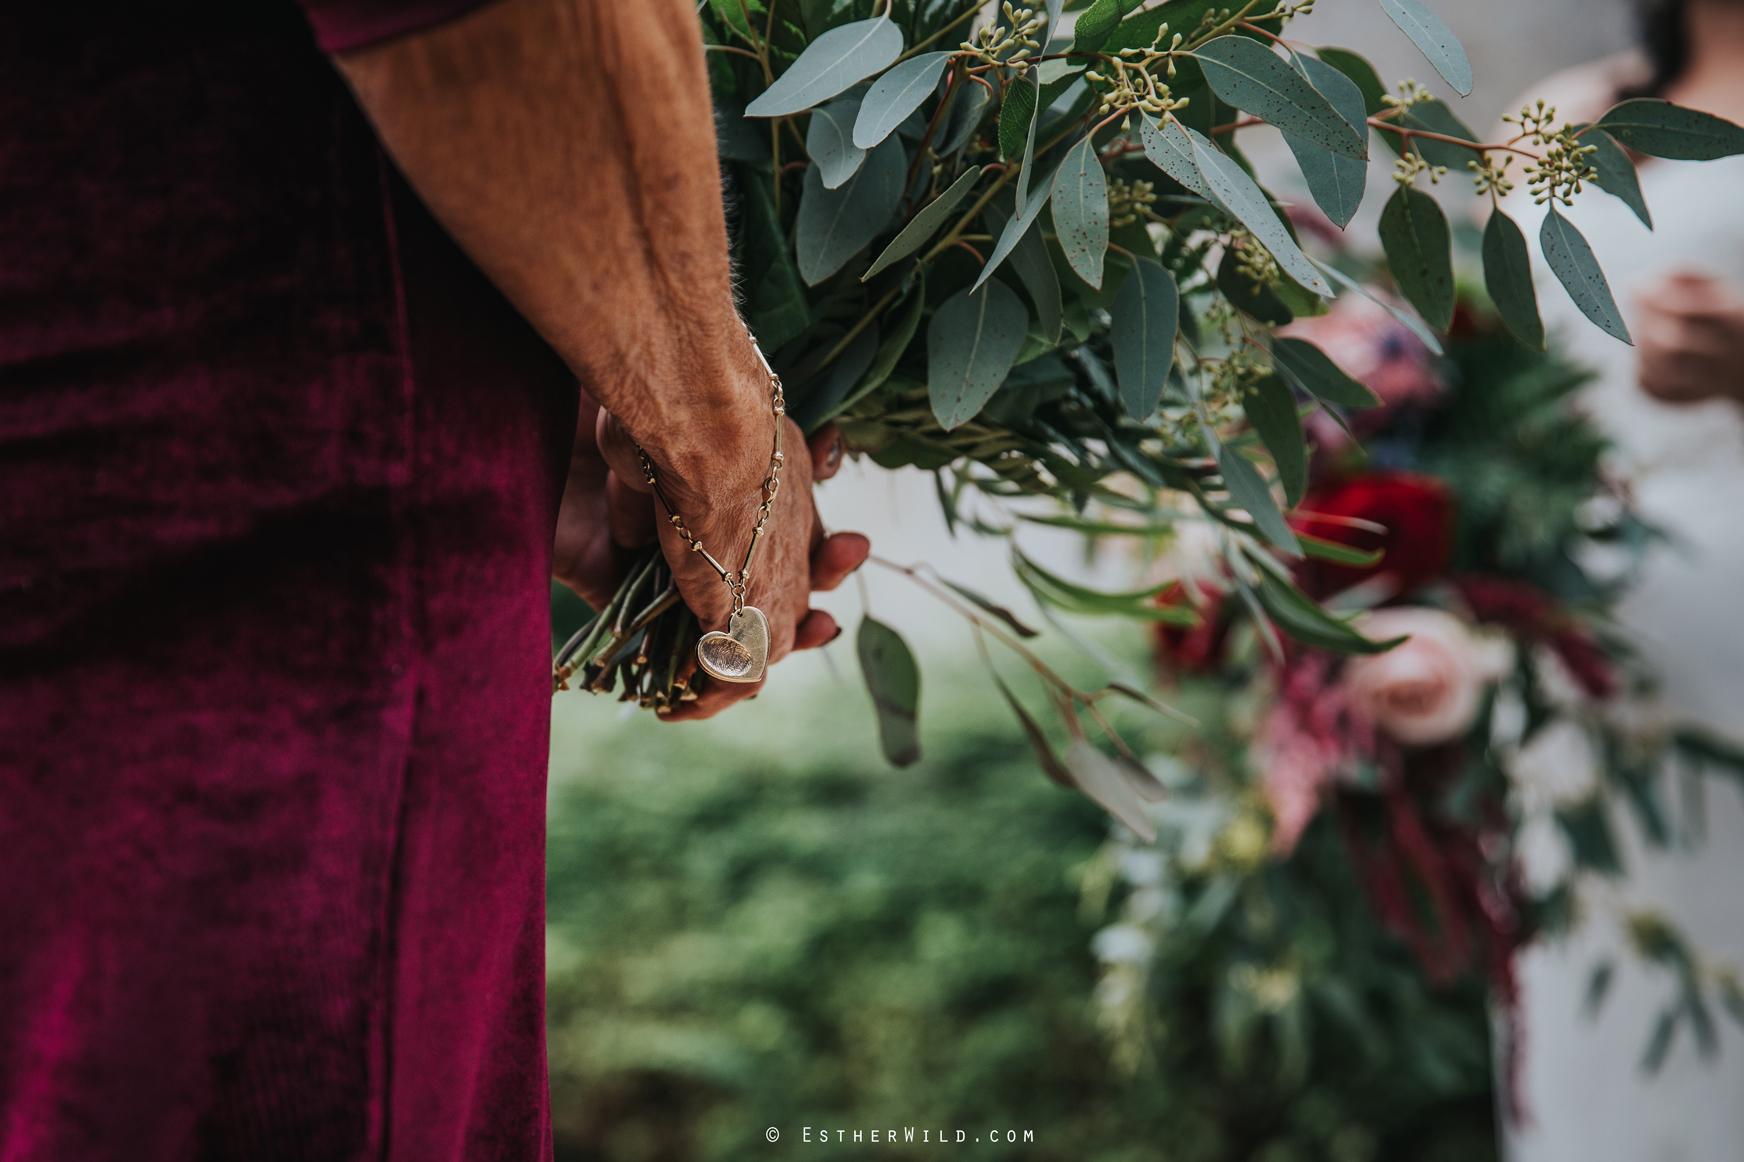 Reading_Room_Weddings_Alby_Norwich_Photographer_Esther_Wild_IMG_0775.jpg